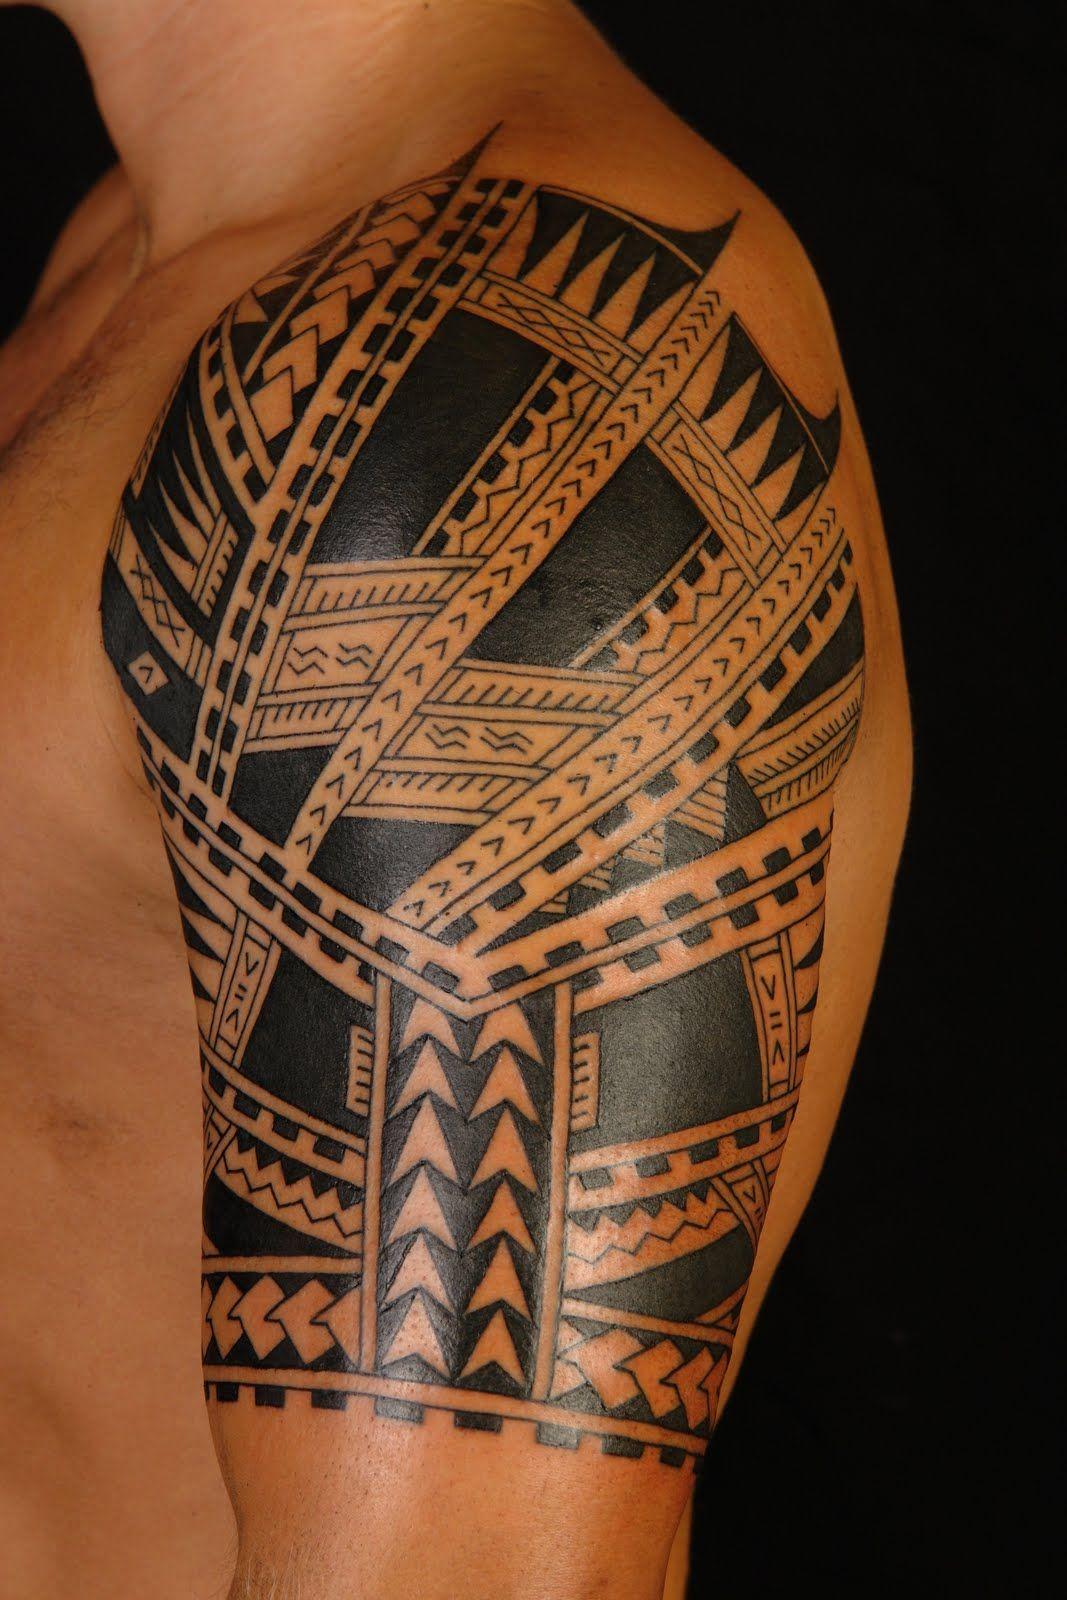 Polynesian Tattoos Designs Ideas And Meaning Tattoos For You Maori Tattoo Designs Samoan Tattoo Half Sleeve Tribal Tattoos